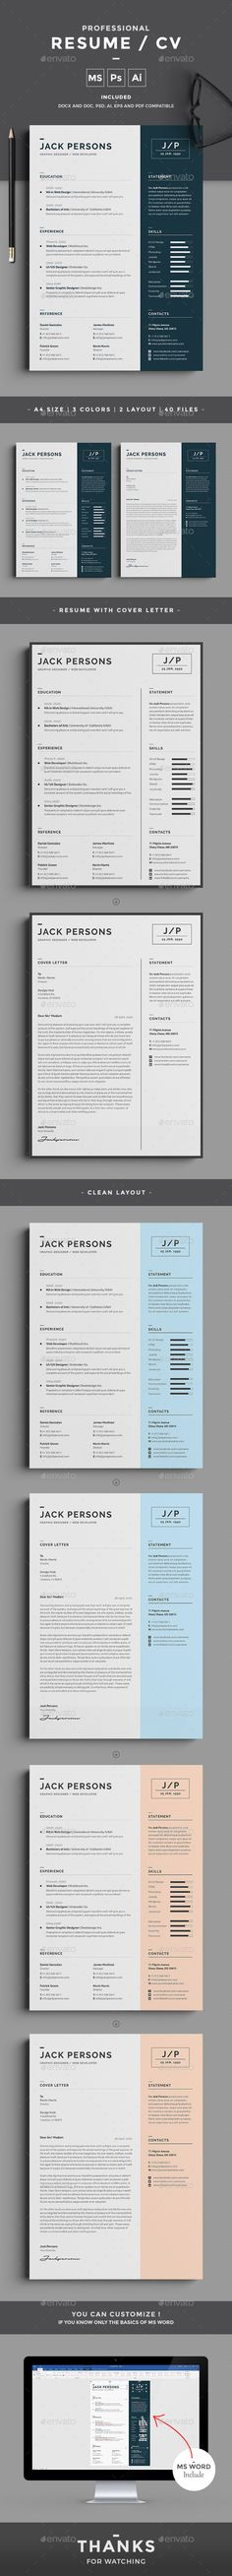 Resume Modern Resume with Photo Resume Template